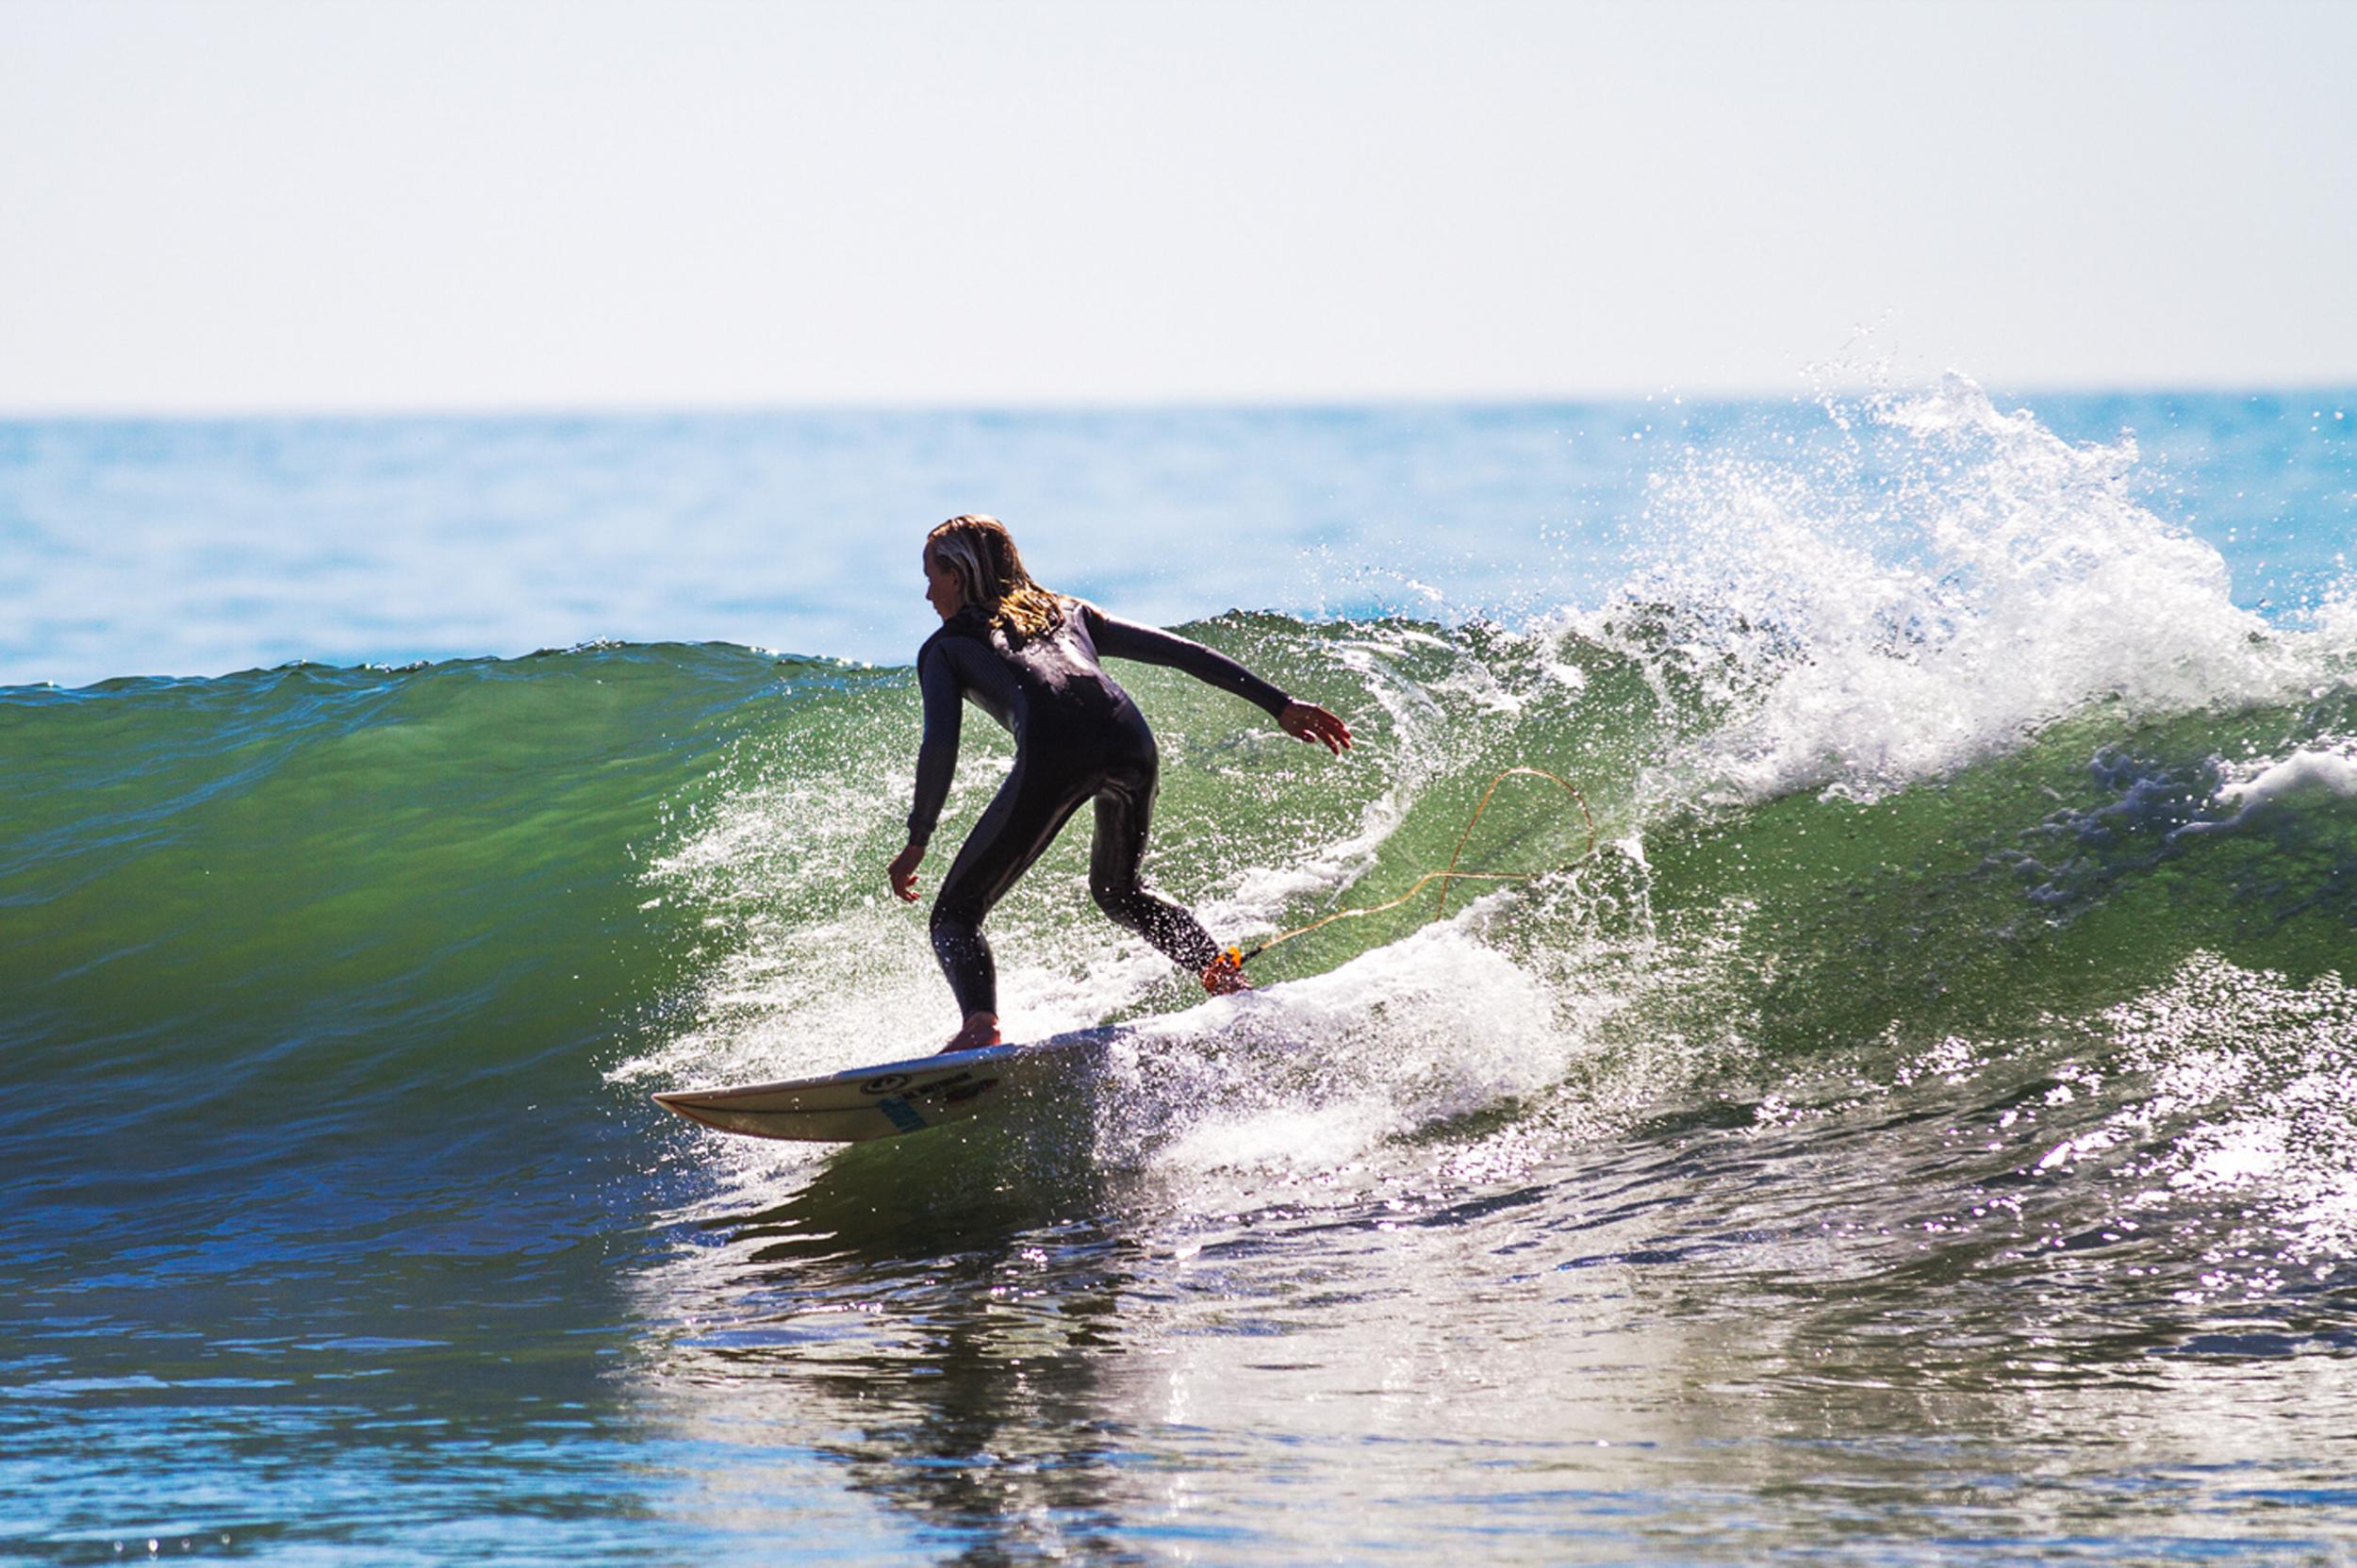 surfer_8x12.jpg